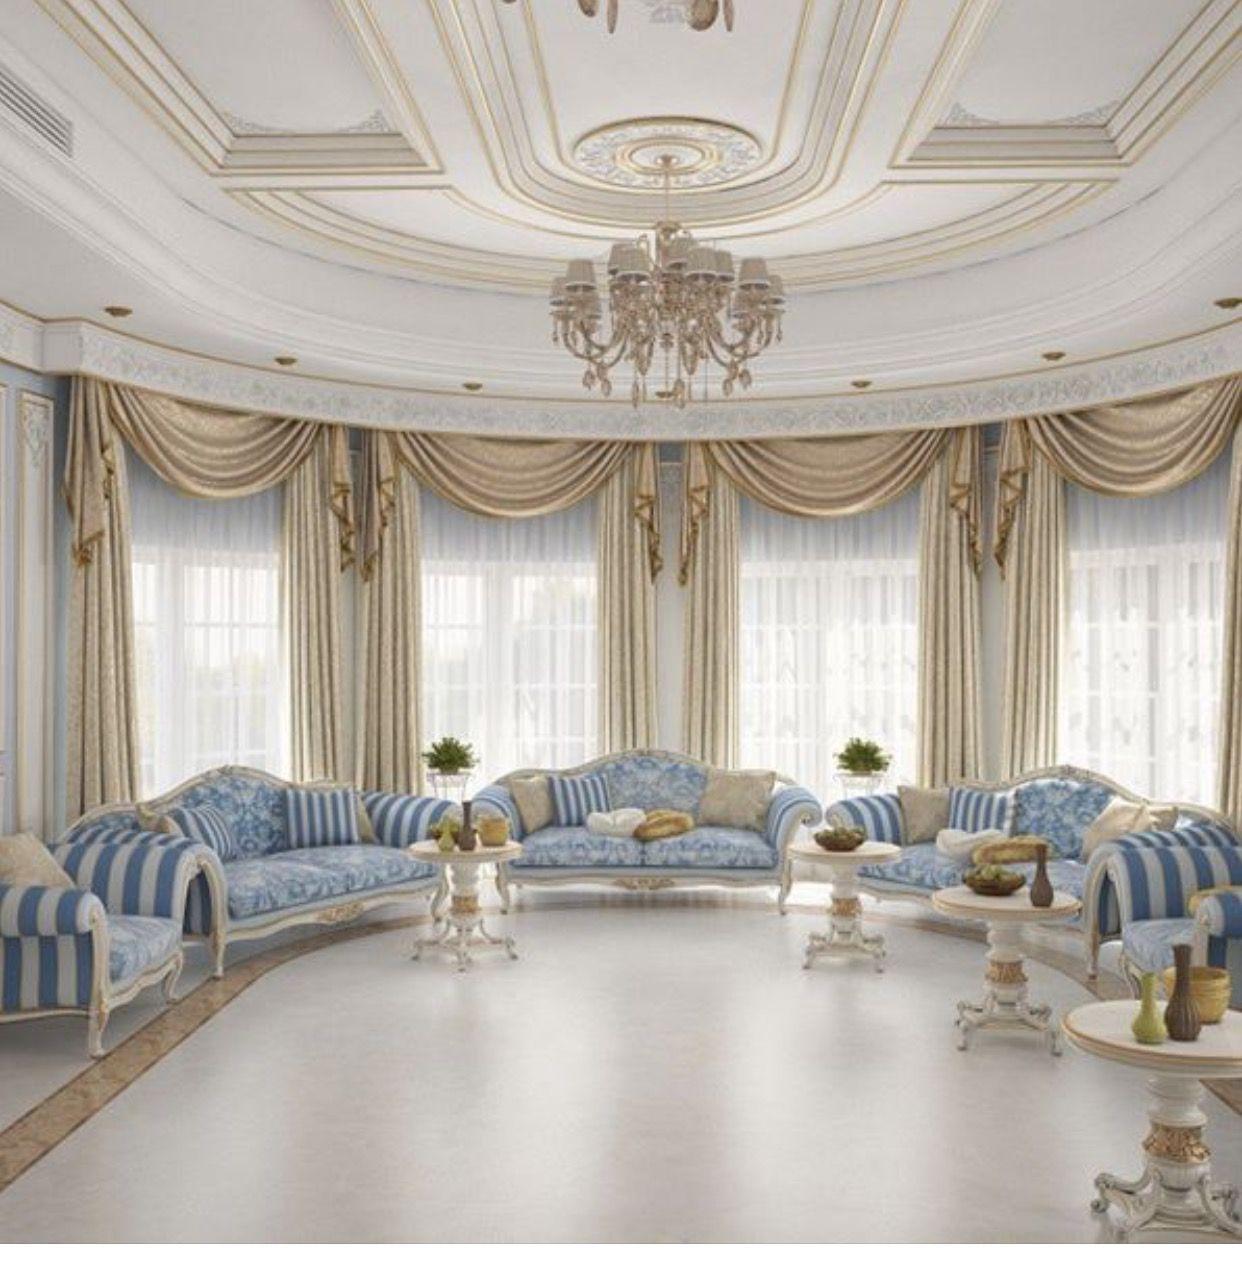 Luxury Apartments Interiors Luxury Living Room Decor: Pin By Liz Nikollaj On Curtains